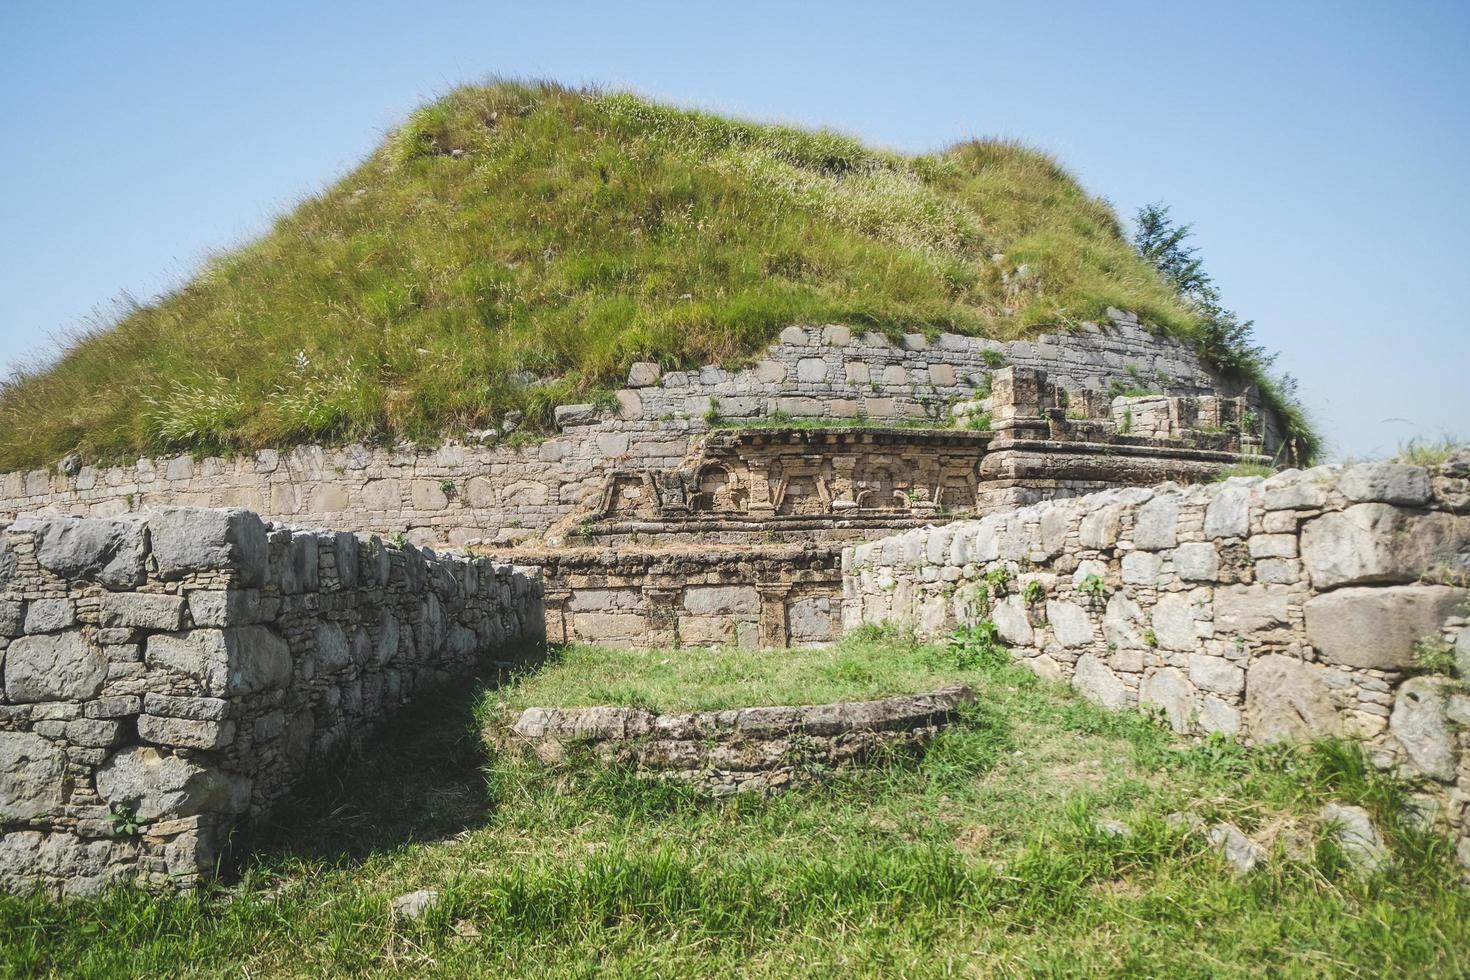 stupa dharmarajika budista histórico no Paquistão foto